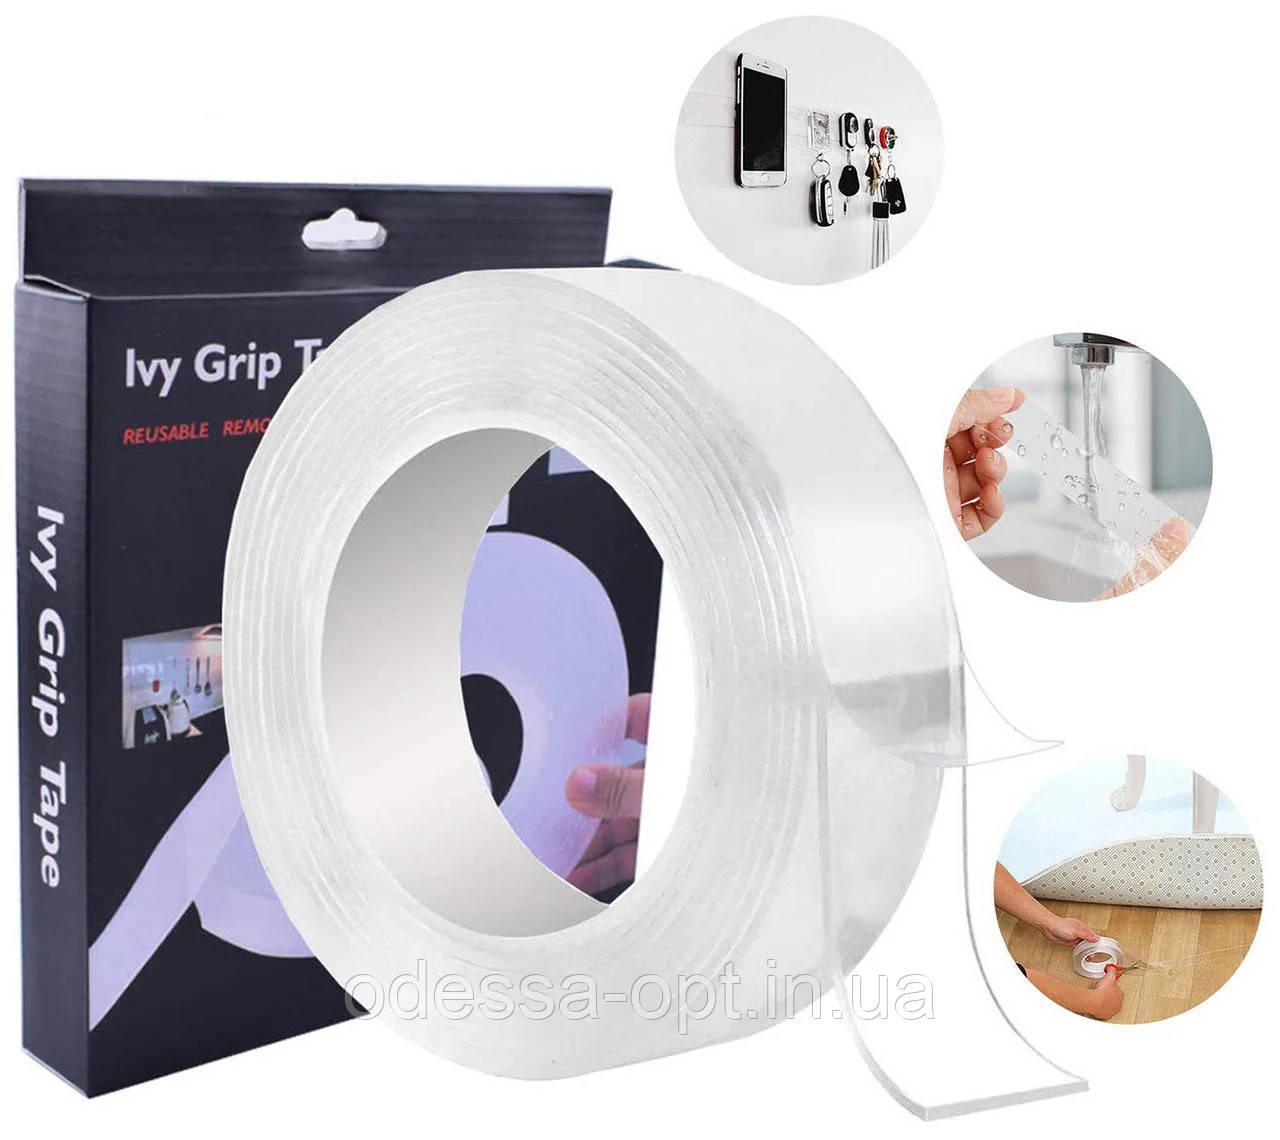 Ivy Grip Tape 5m (60)